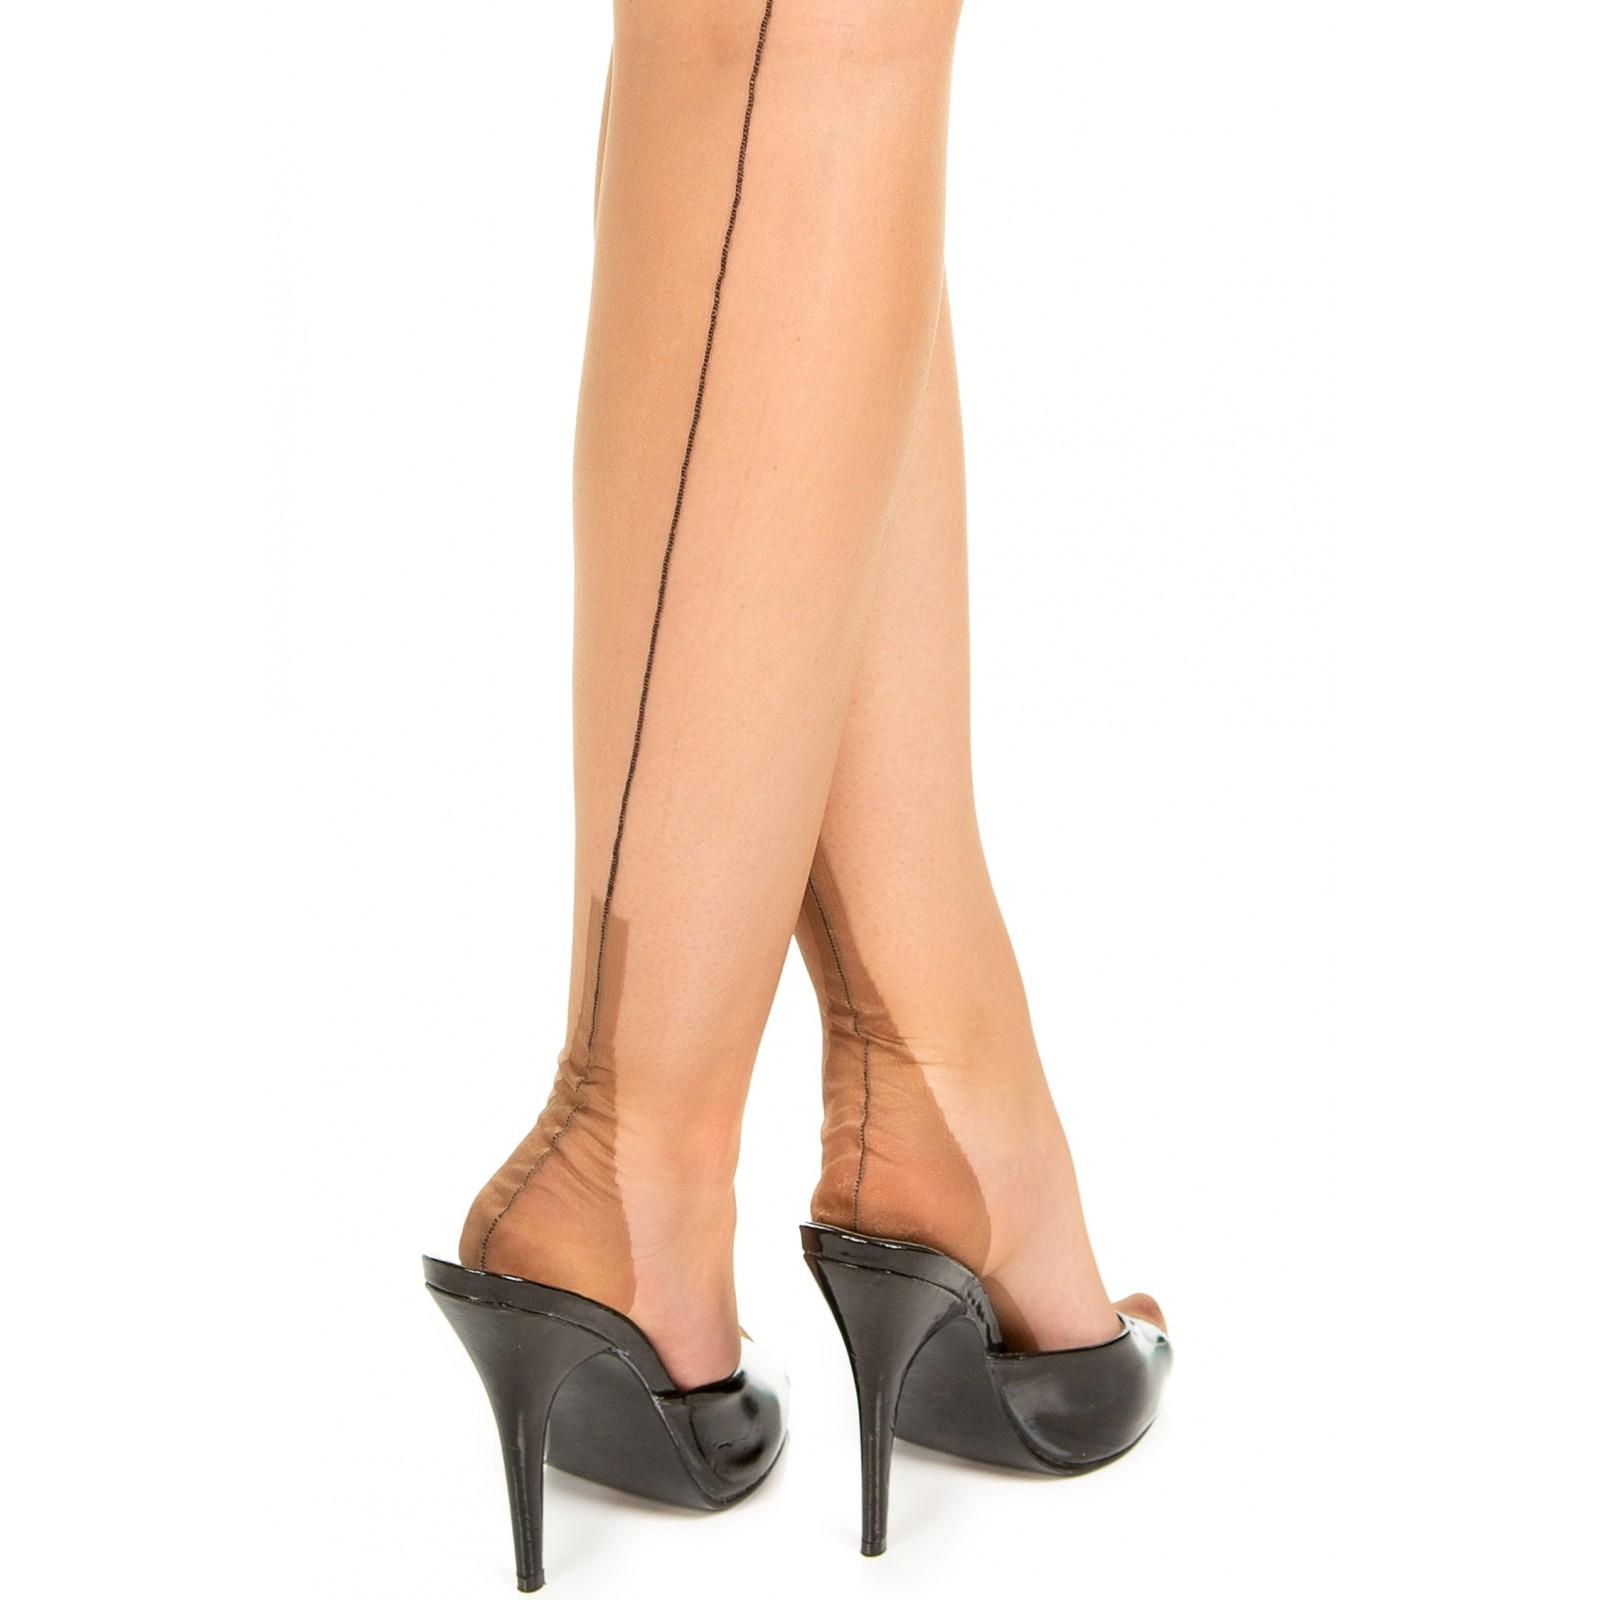 GIO FF Fully Fashioned Cuban Heel Seamed Stockings Black